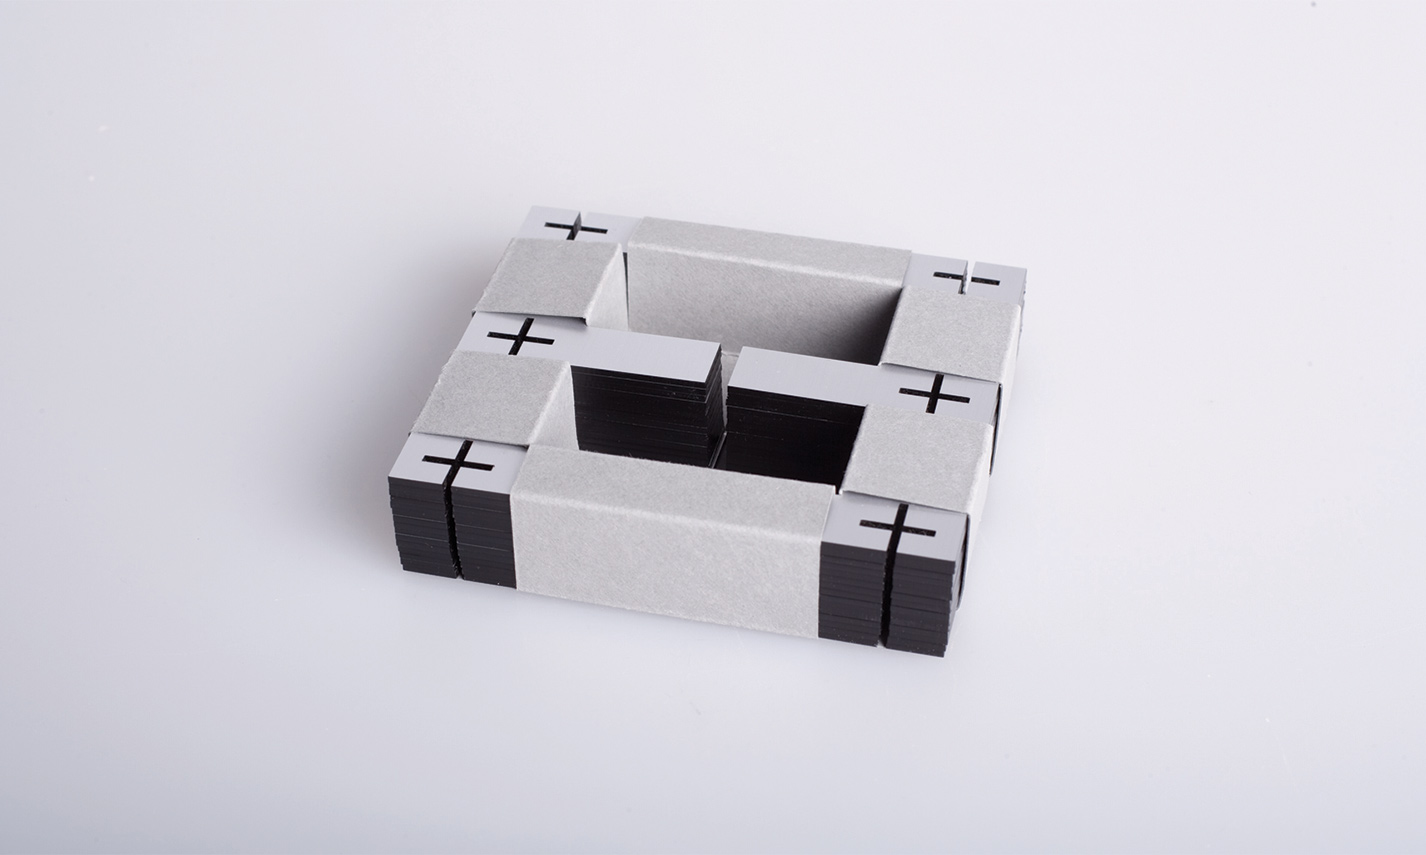 Esteck Steckskulptur Buchstabe Letter E Packaging